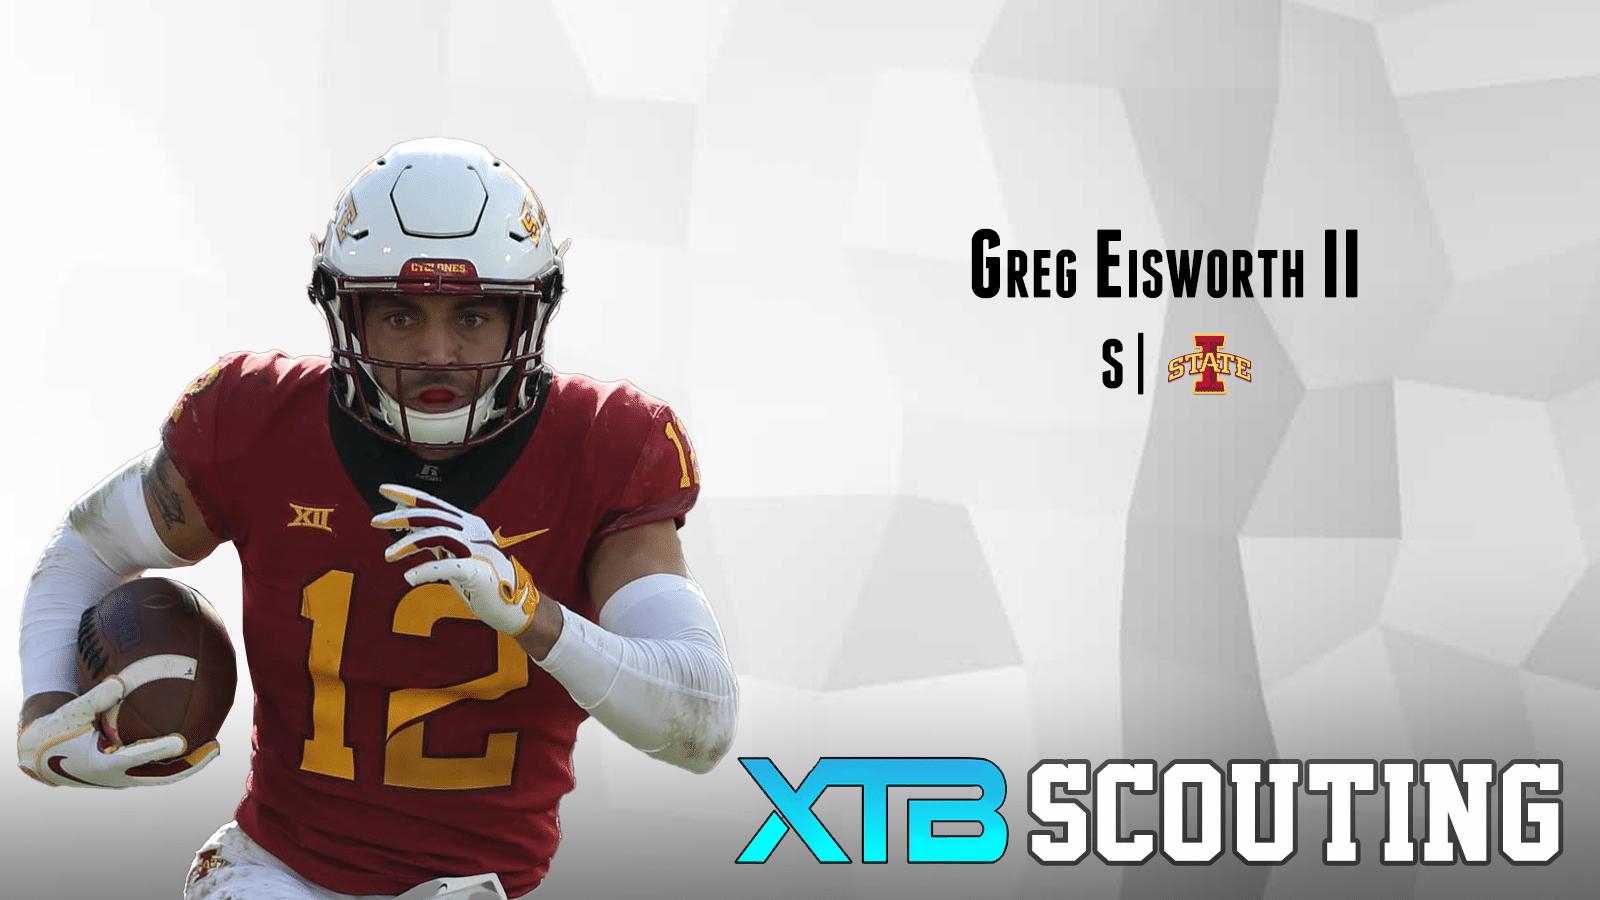 Greg Eisworth